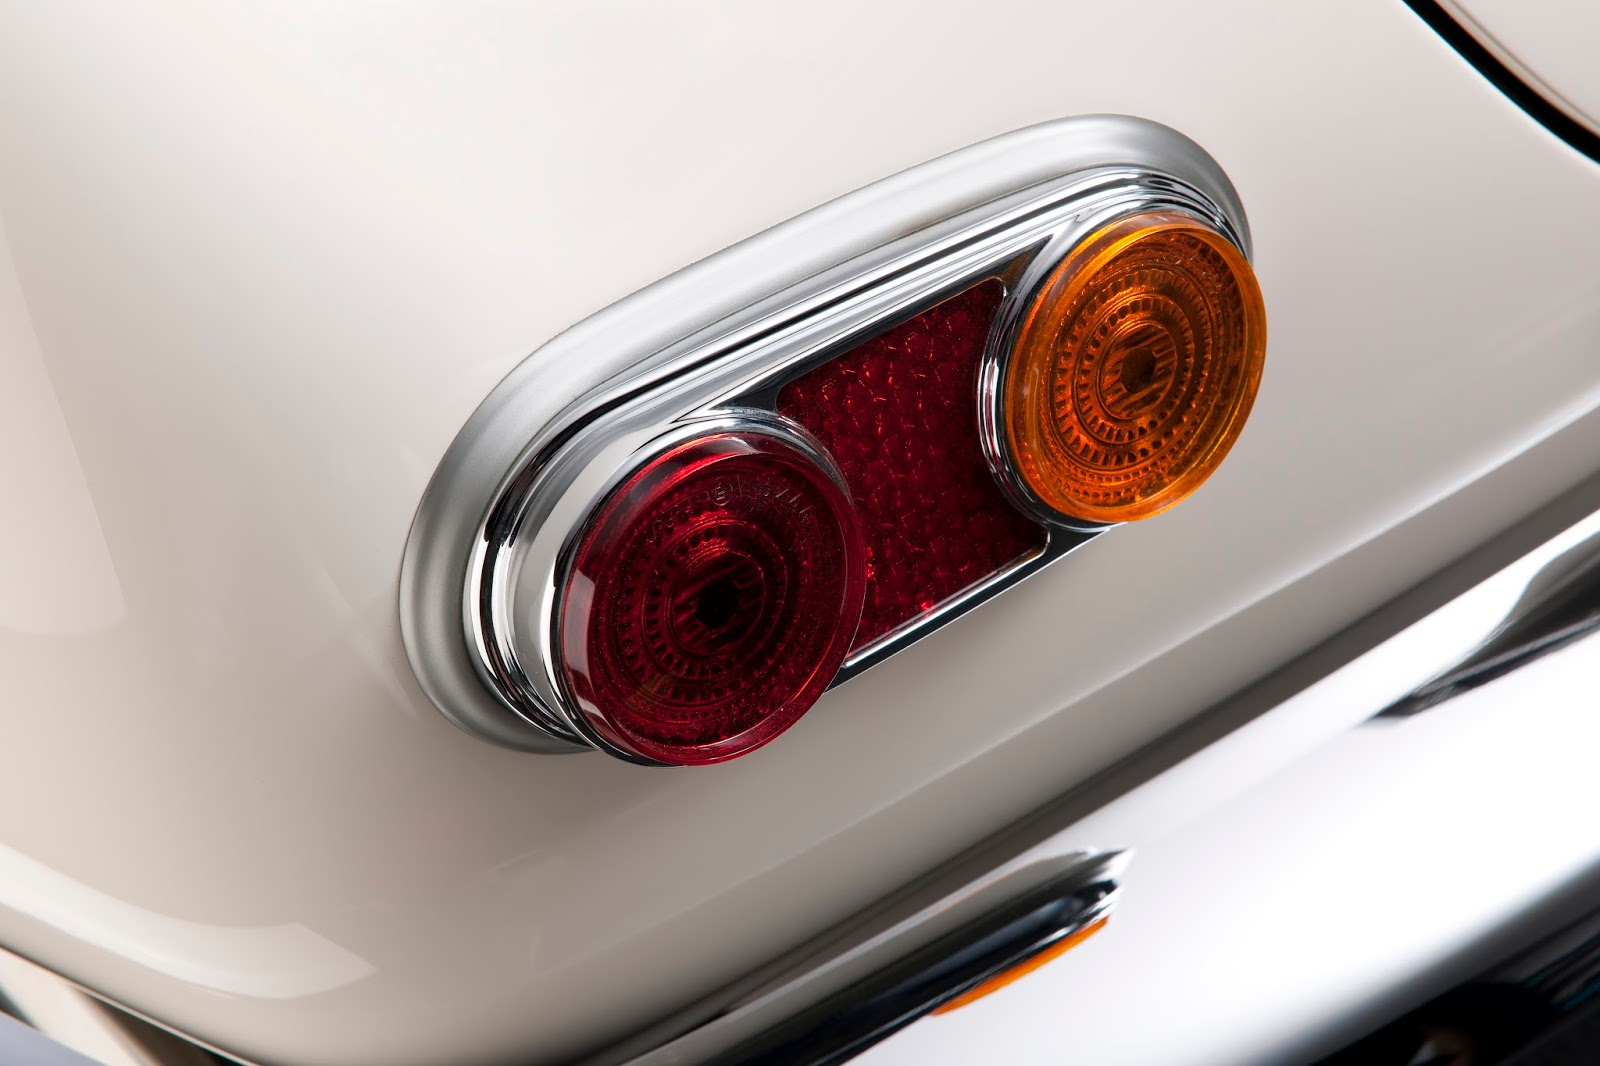 P90229732 highRes elvis bmw 507 08 201 Η επιστροφή της μυθικής BMW 507 του Elvis στο Concours d'Elegance, Pebble Beach autoshow, BMW, BMW 507, Classic, Concours d'Elegance, Roadster, zblog